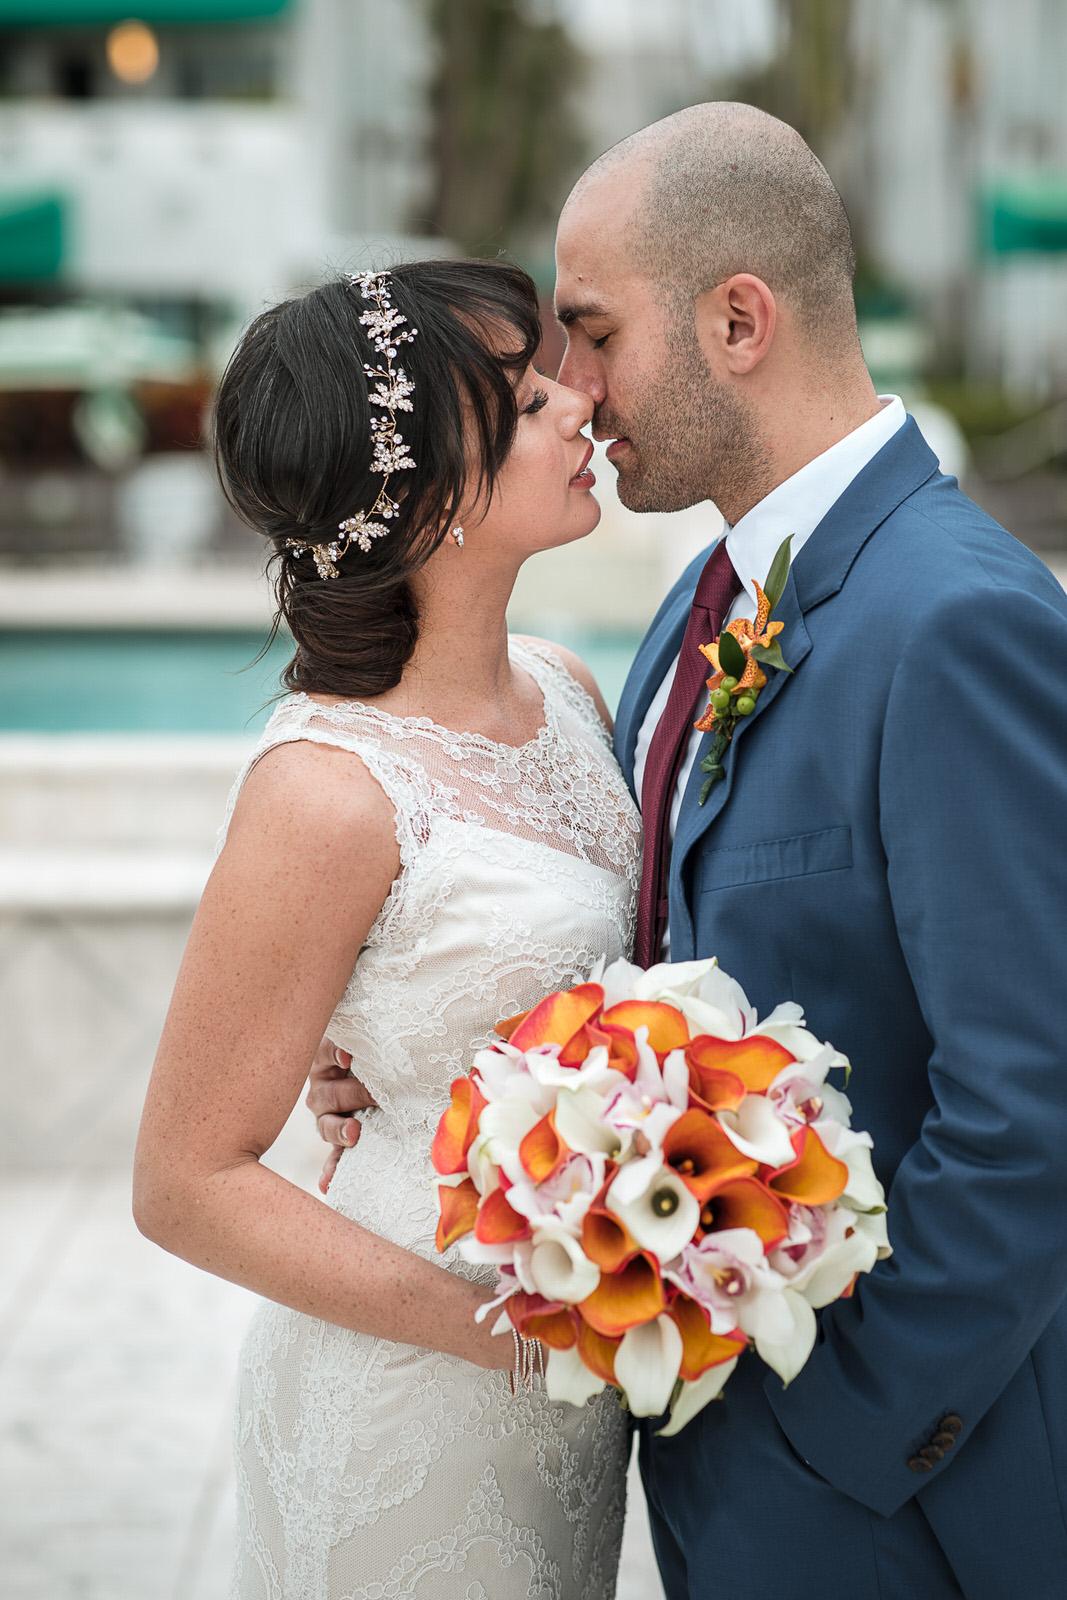 MARIAND & NICK - WEDDING AT THE KIMPTON SURFCOMBER, MIAMI FLORIDA